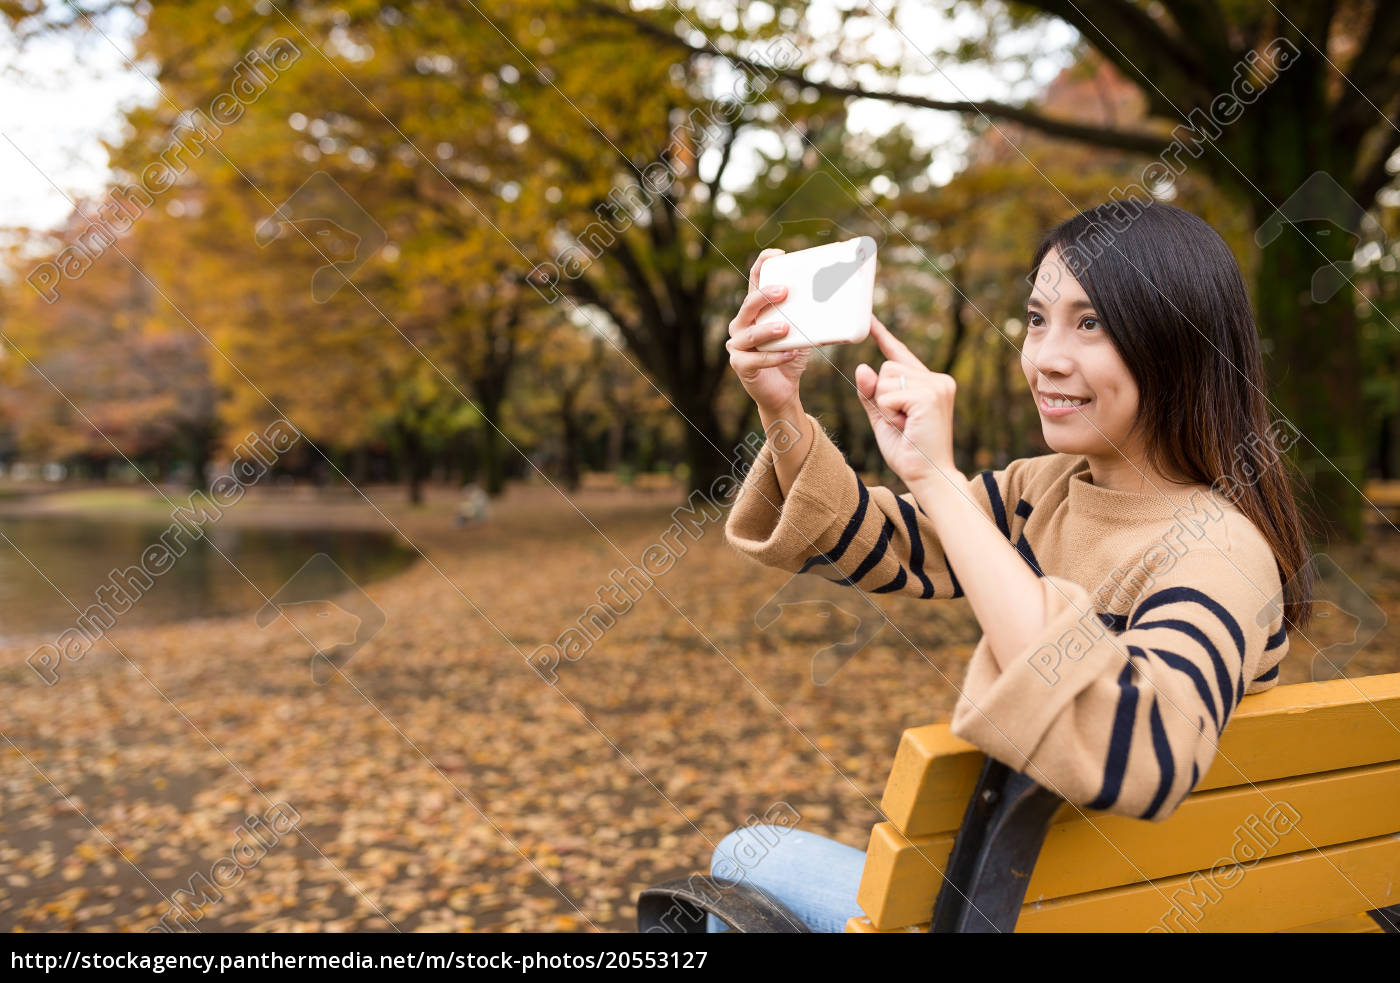 woman, using, mobile, phone, to, take - 20553127